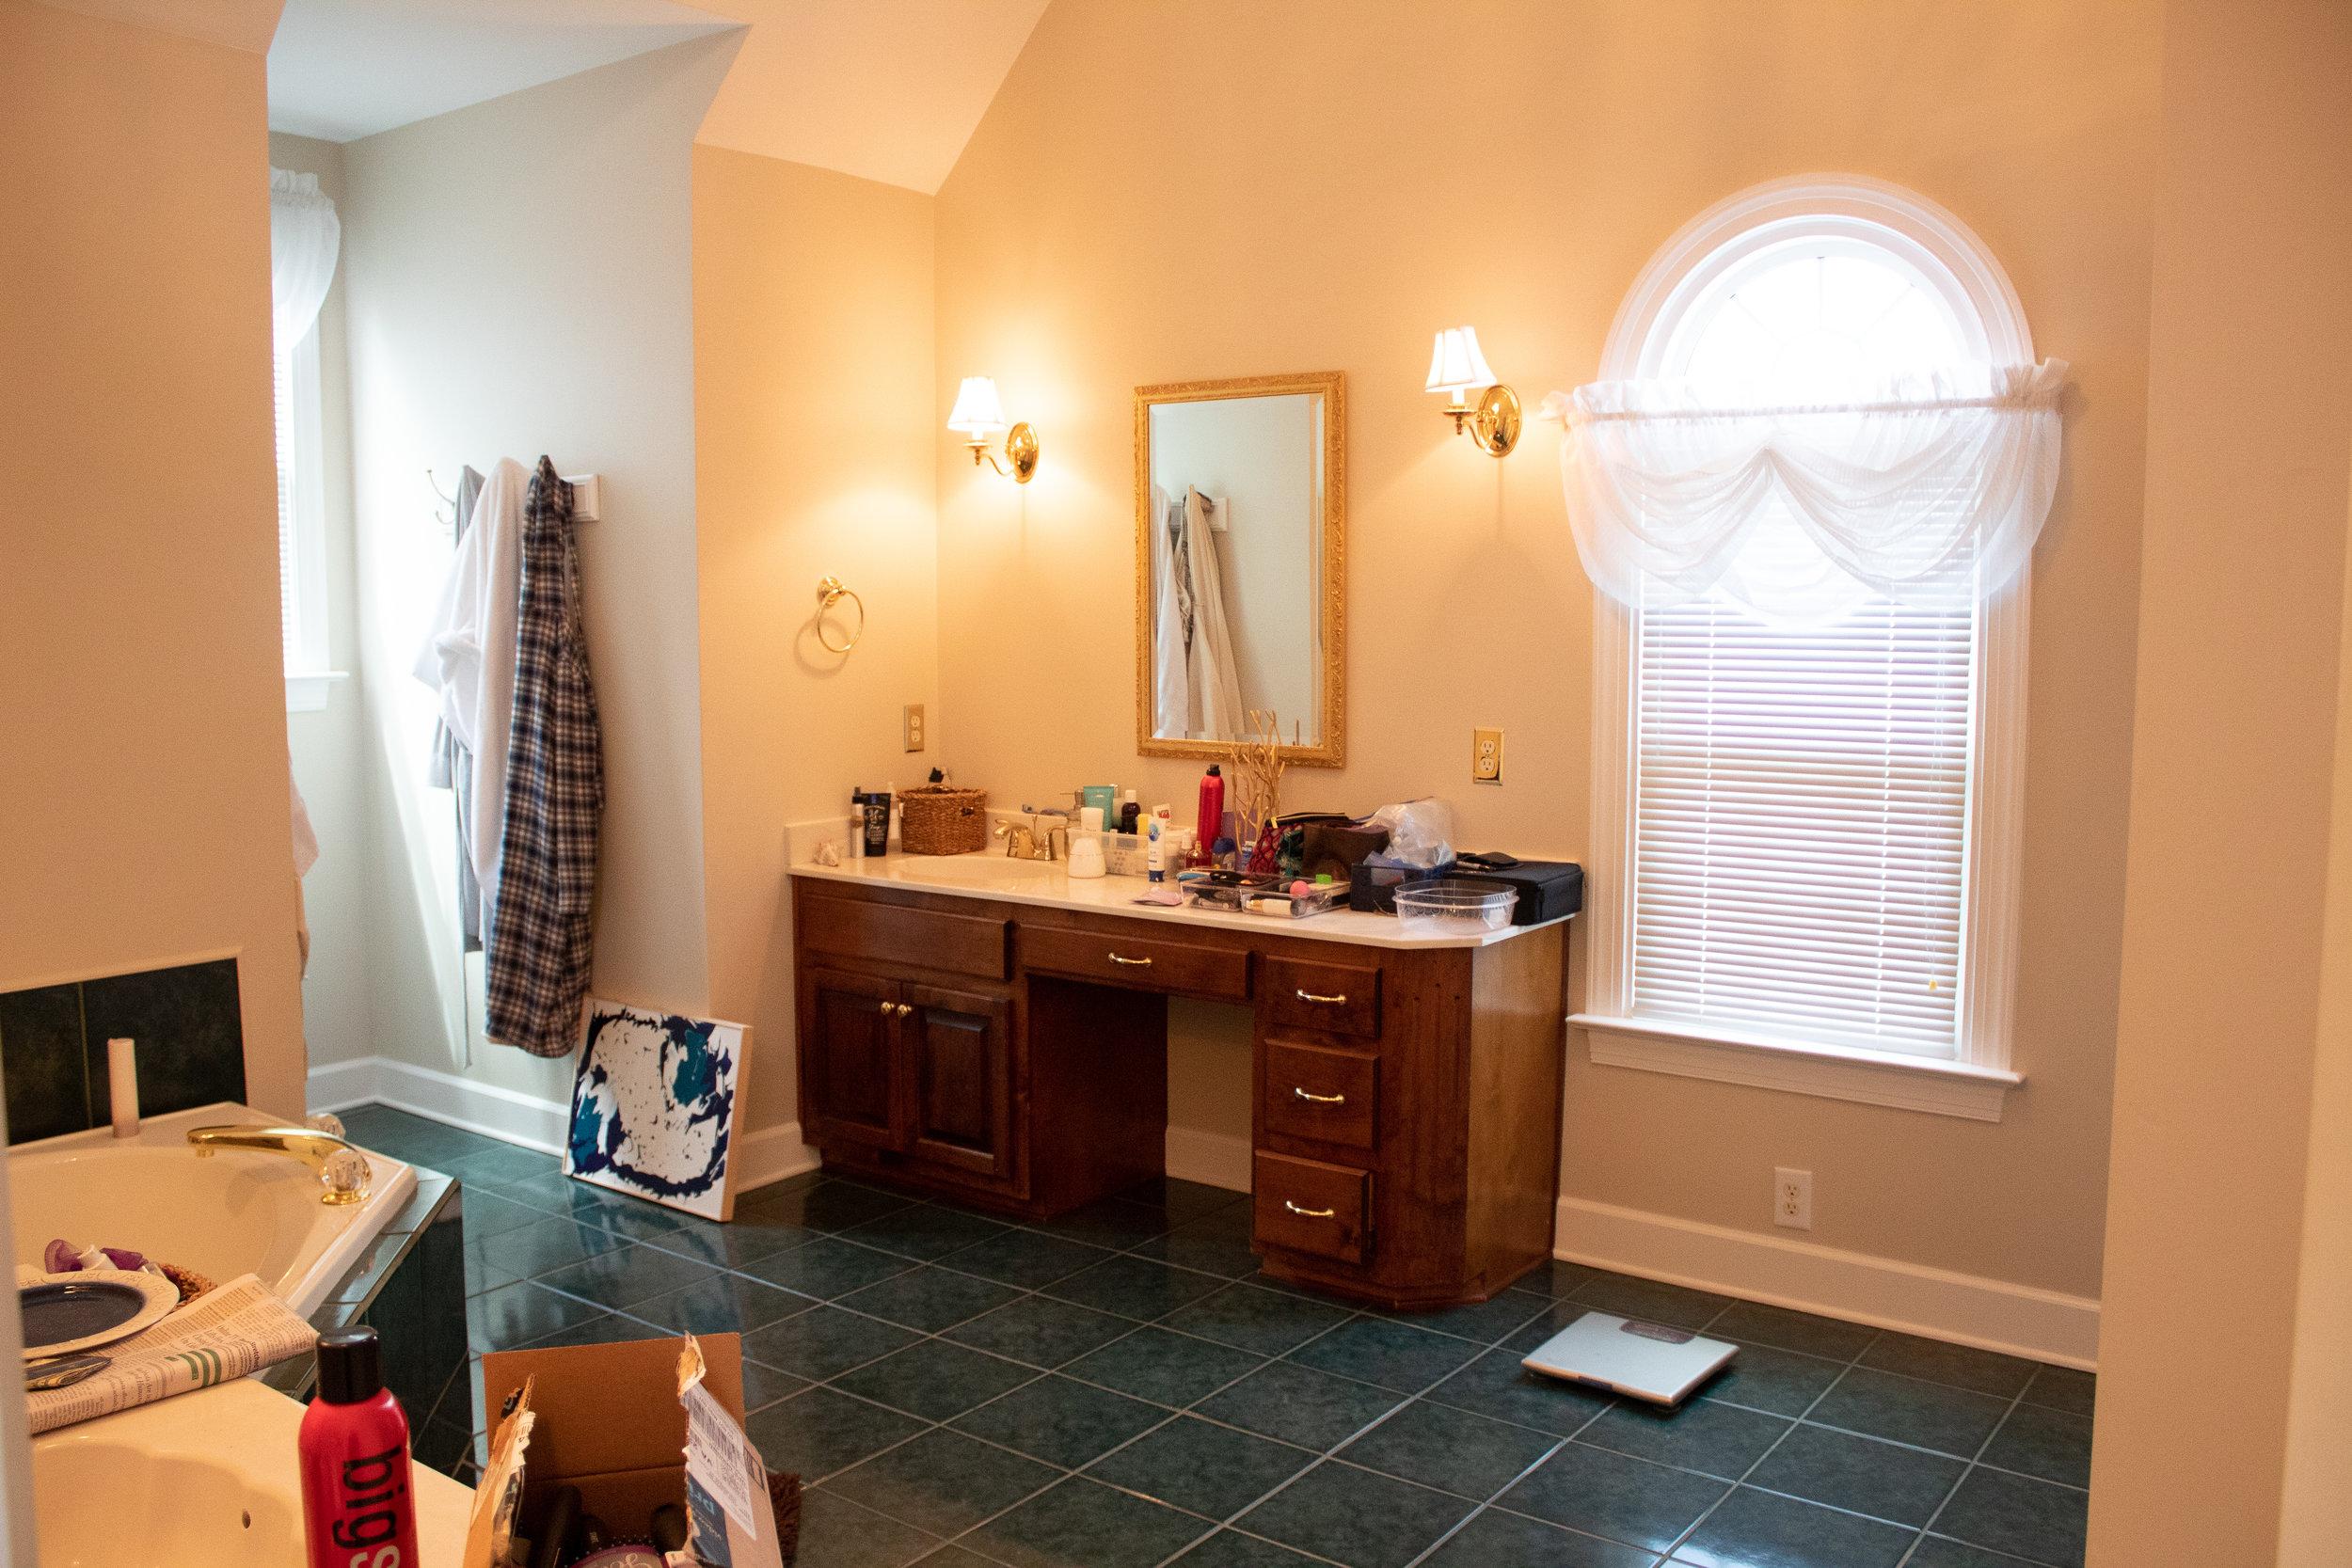 Timeless Bathroom Remodel Benson Homes, Bathroom Remodeling Chesapeake Va